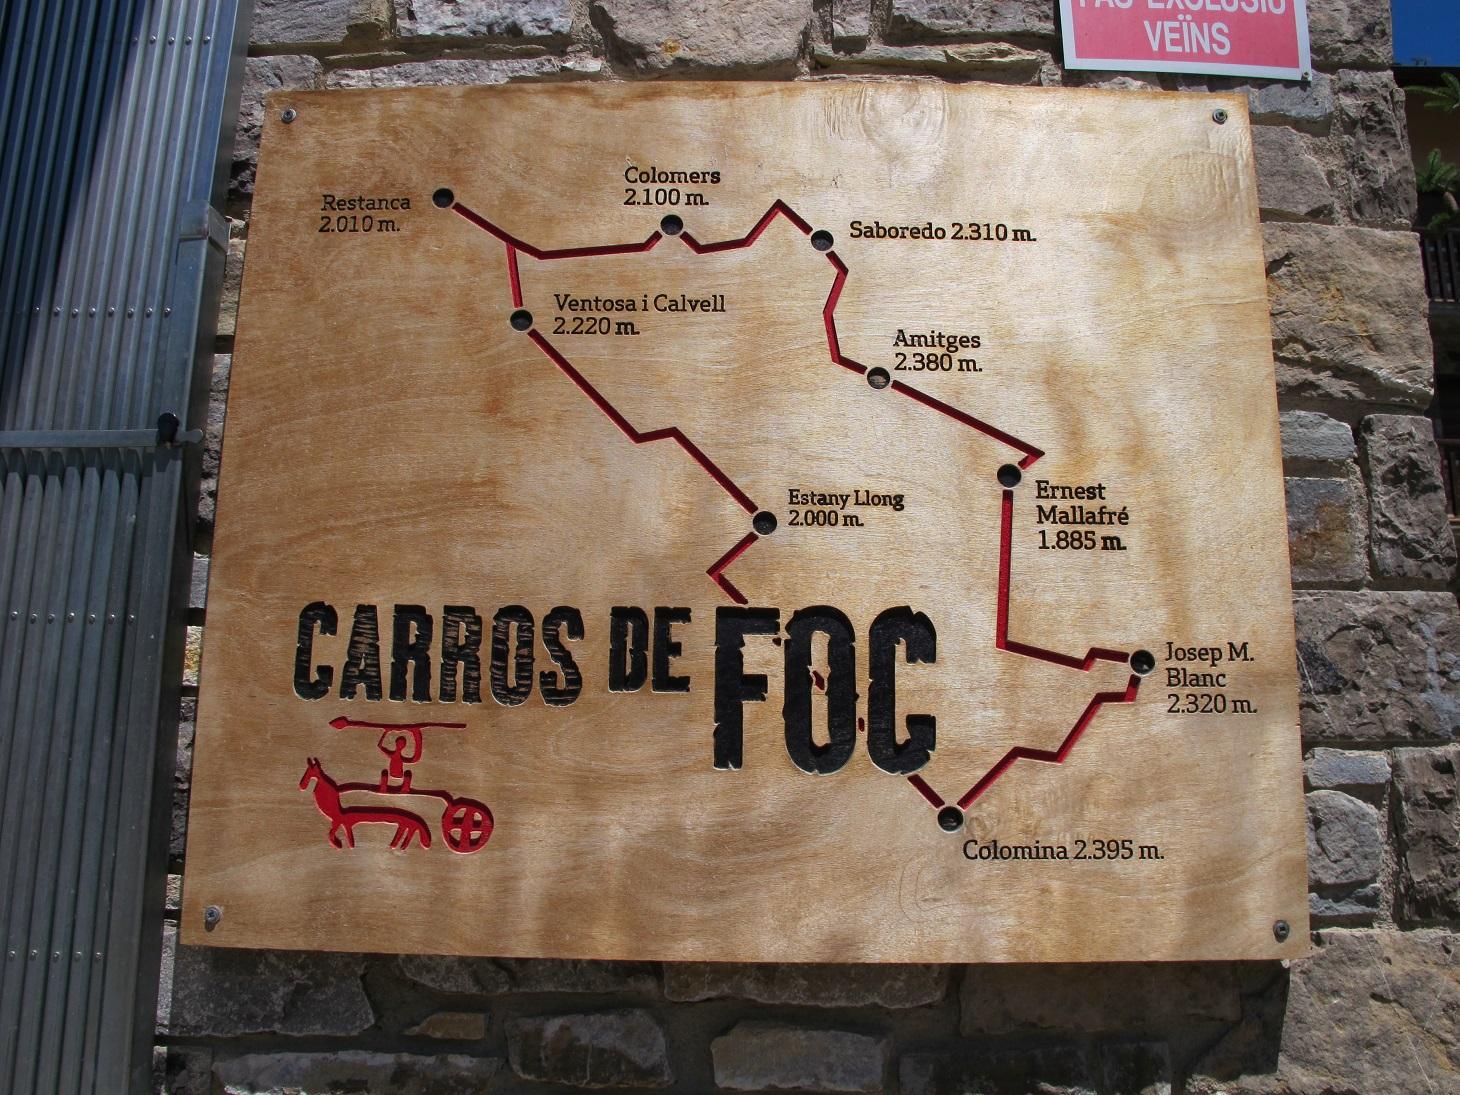 Itinerario Carros de Foc